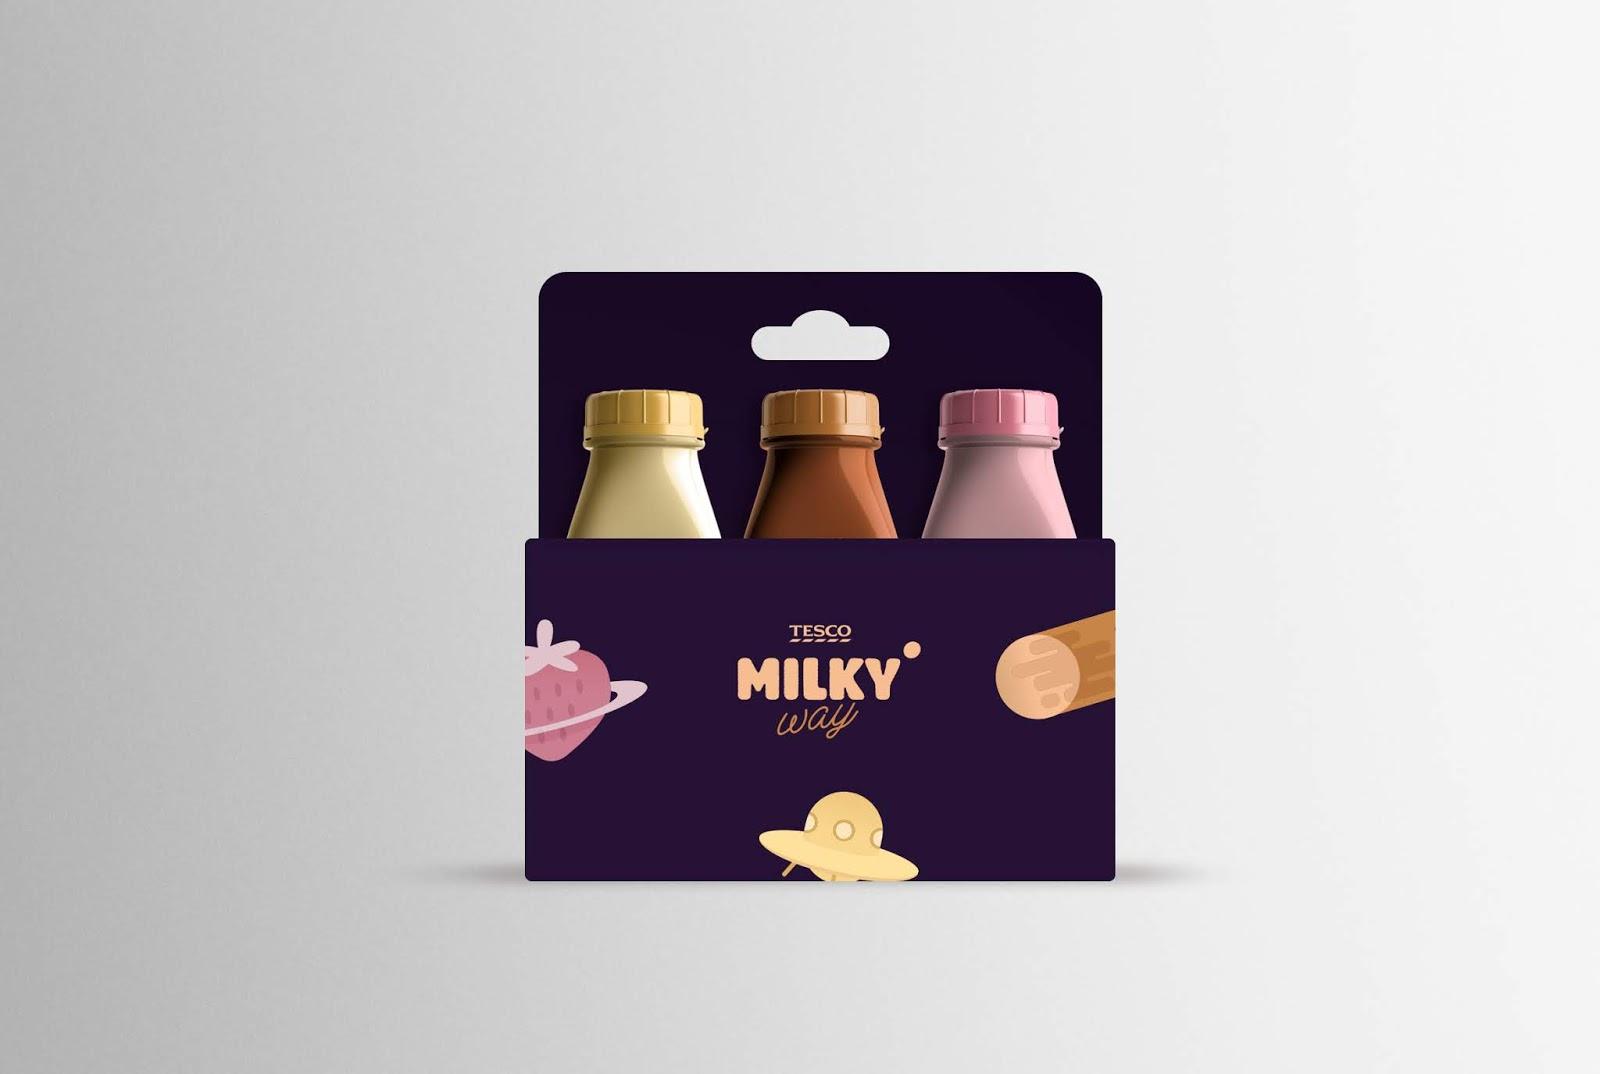 Milkyway奶昔品牌包装设计